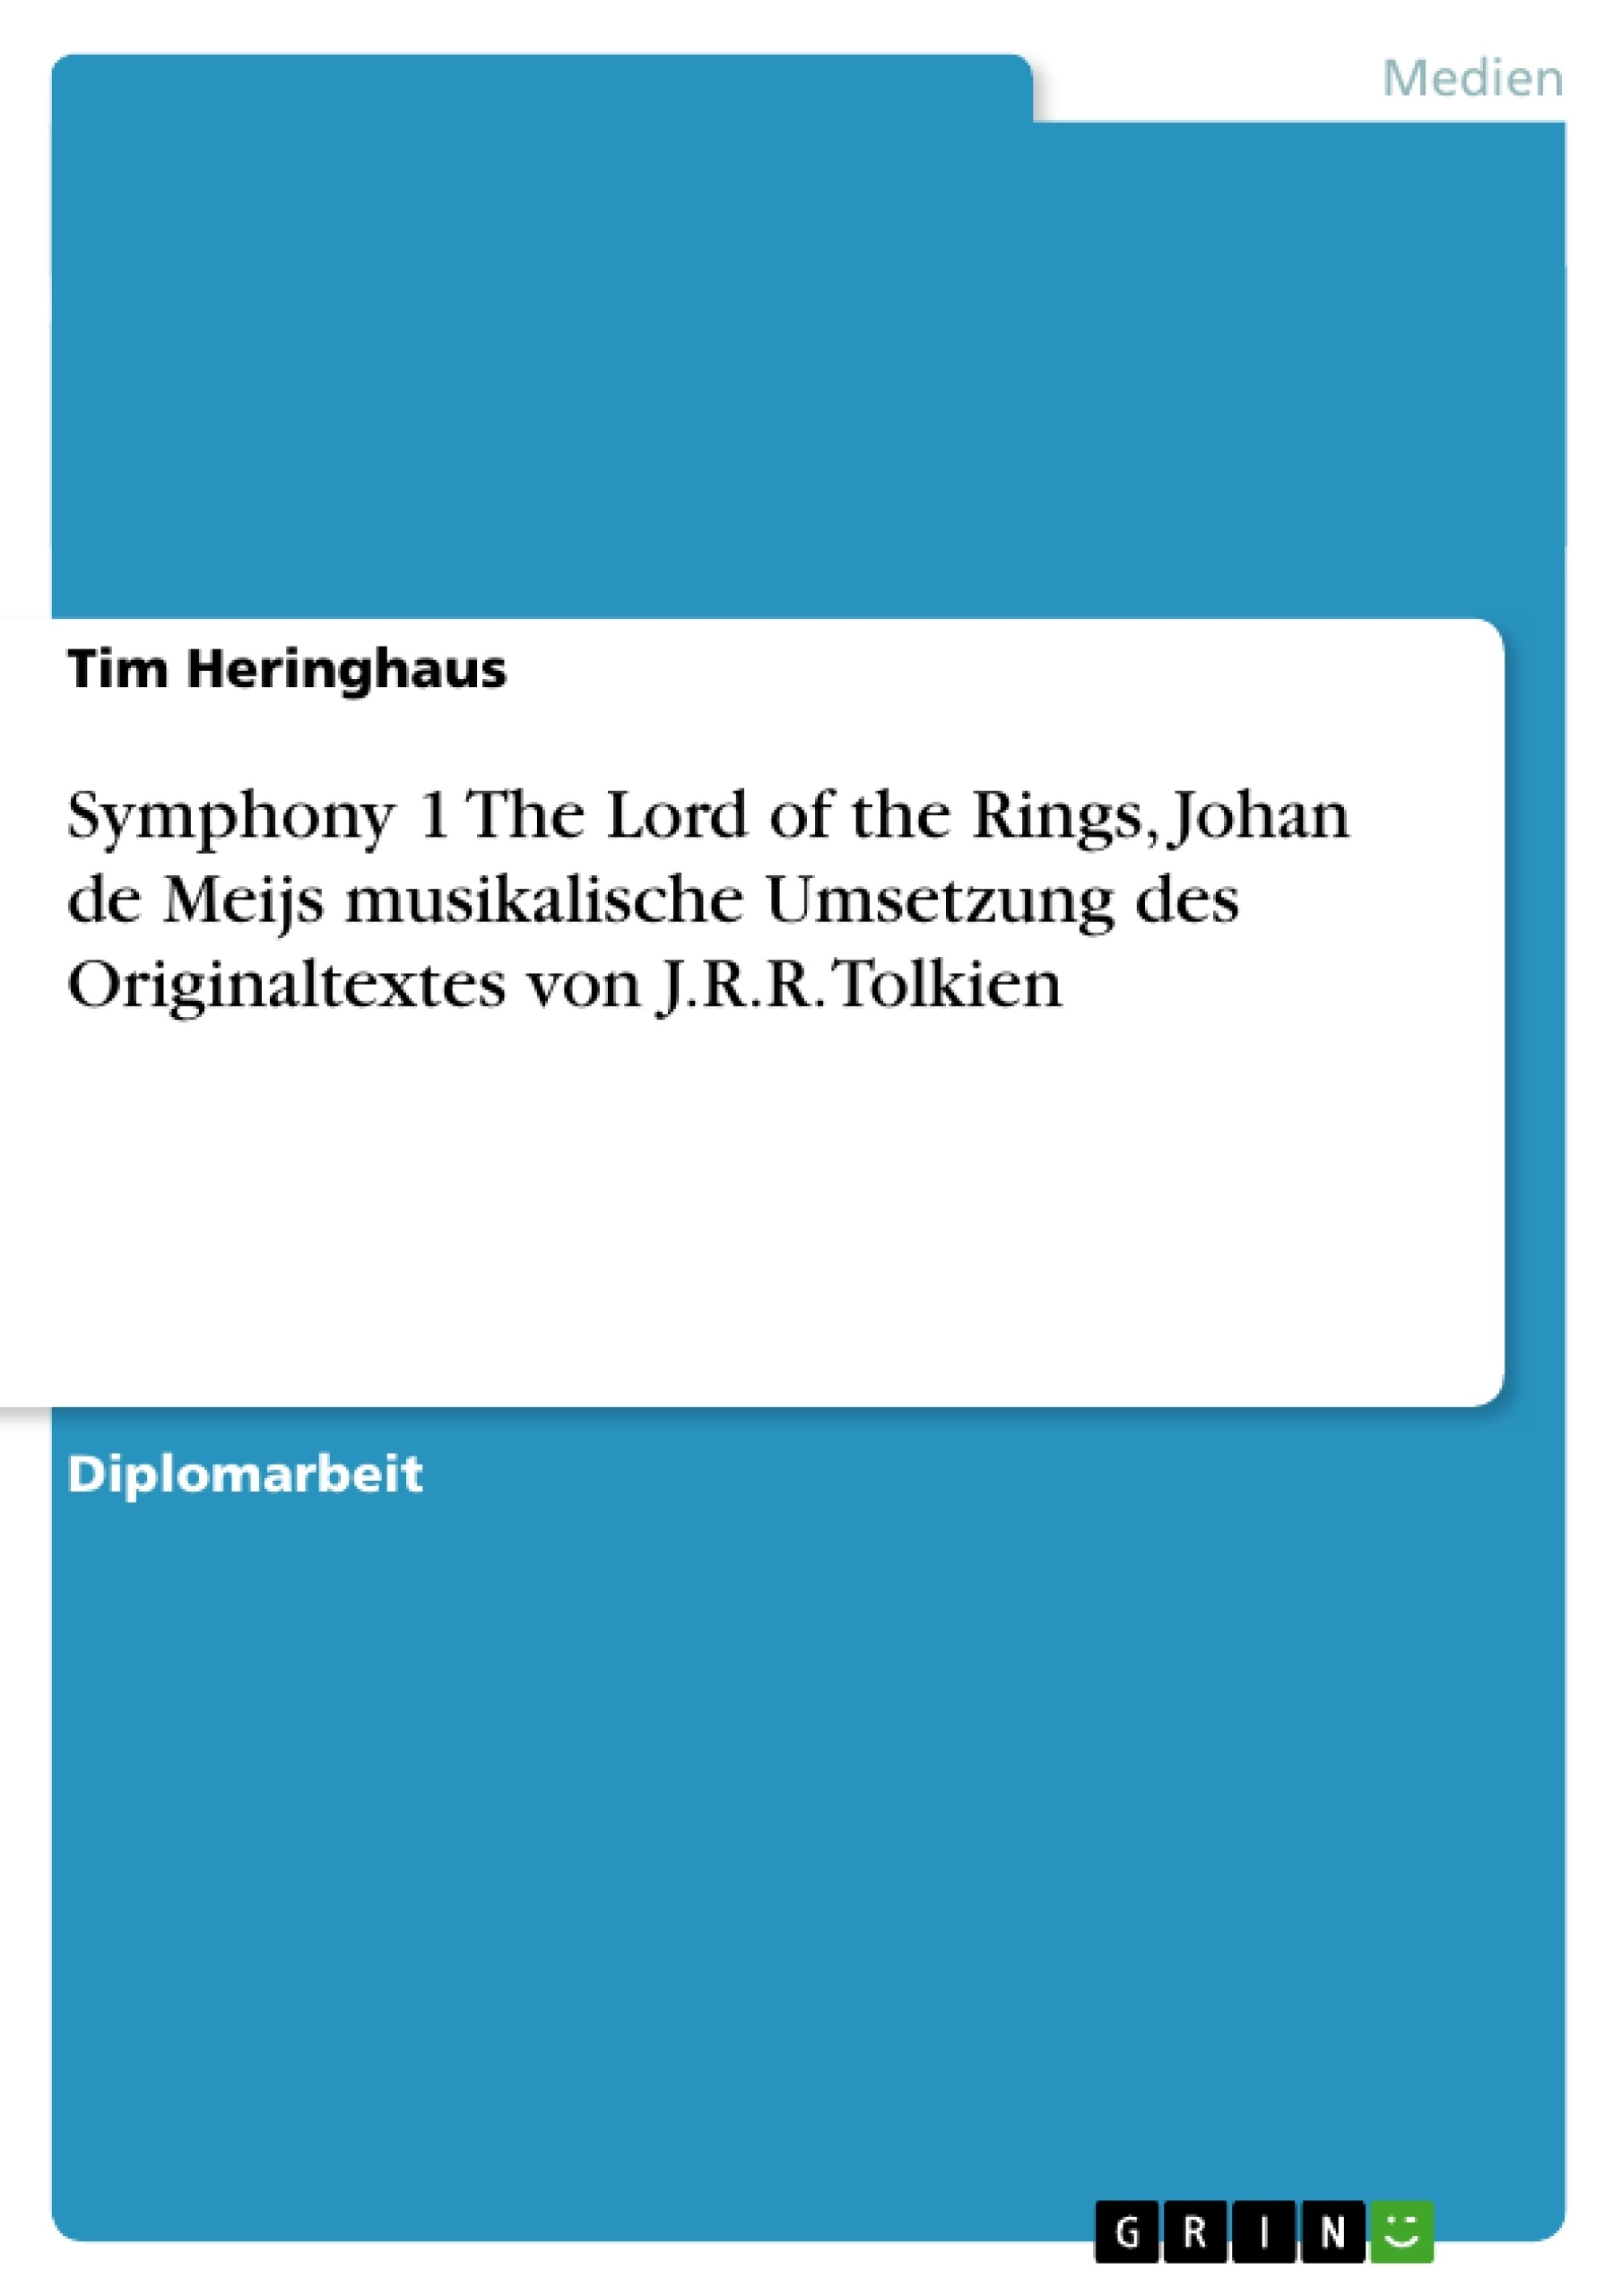 Titel: Symphony 1 The Lord of the Rings, Johan de Meijs musikalische Umsetzung des Originaltextes von J.R.R. Tolkien